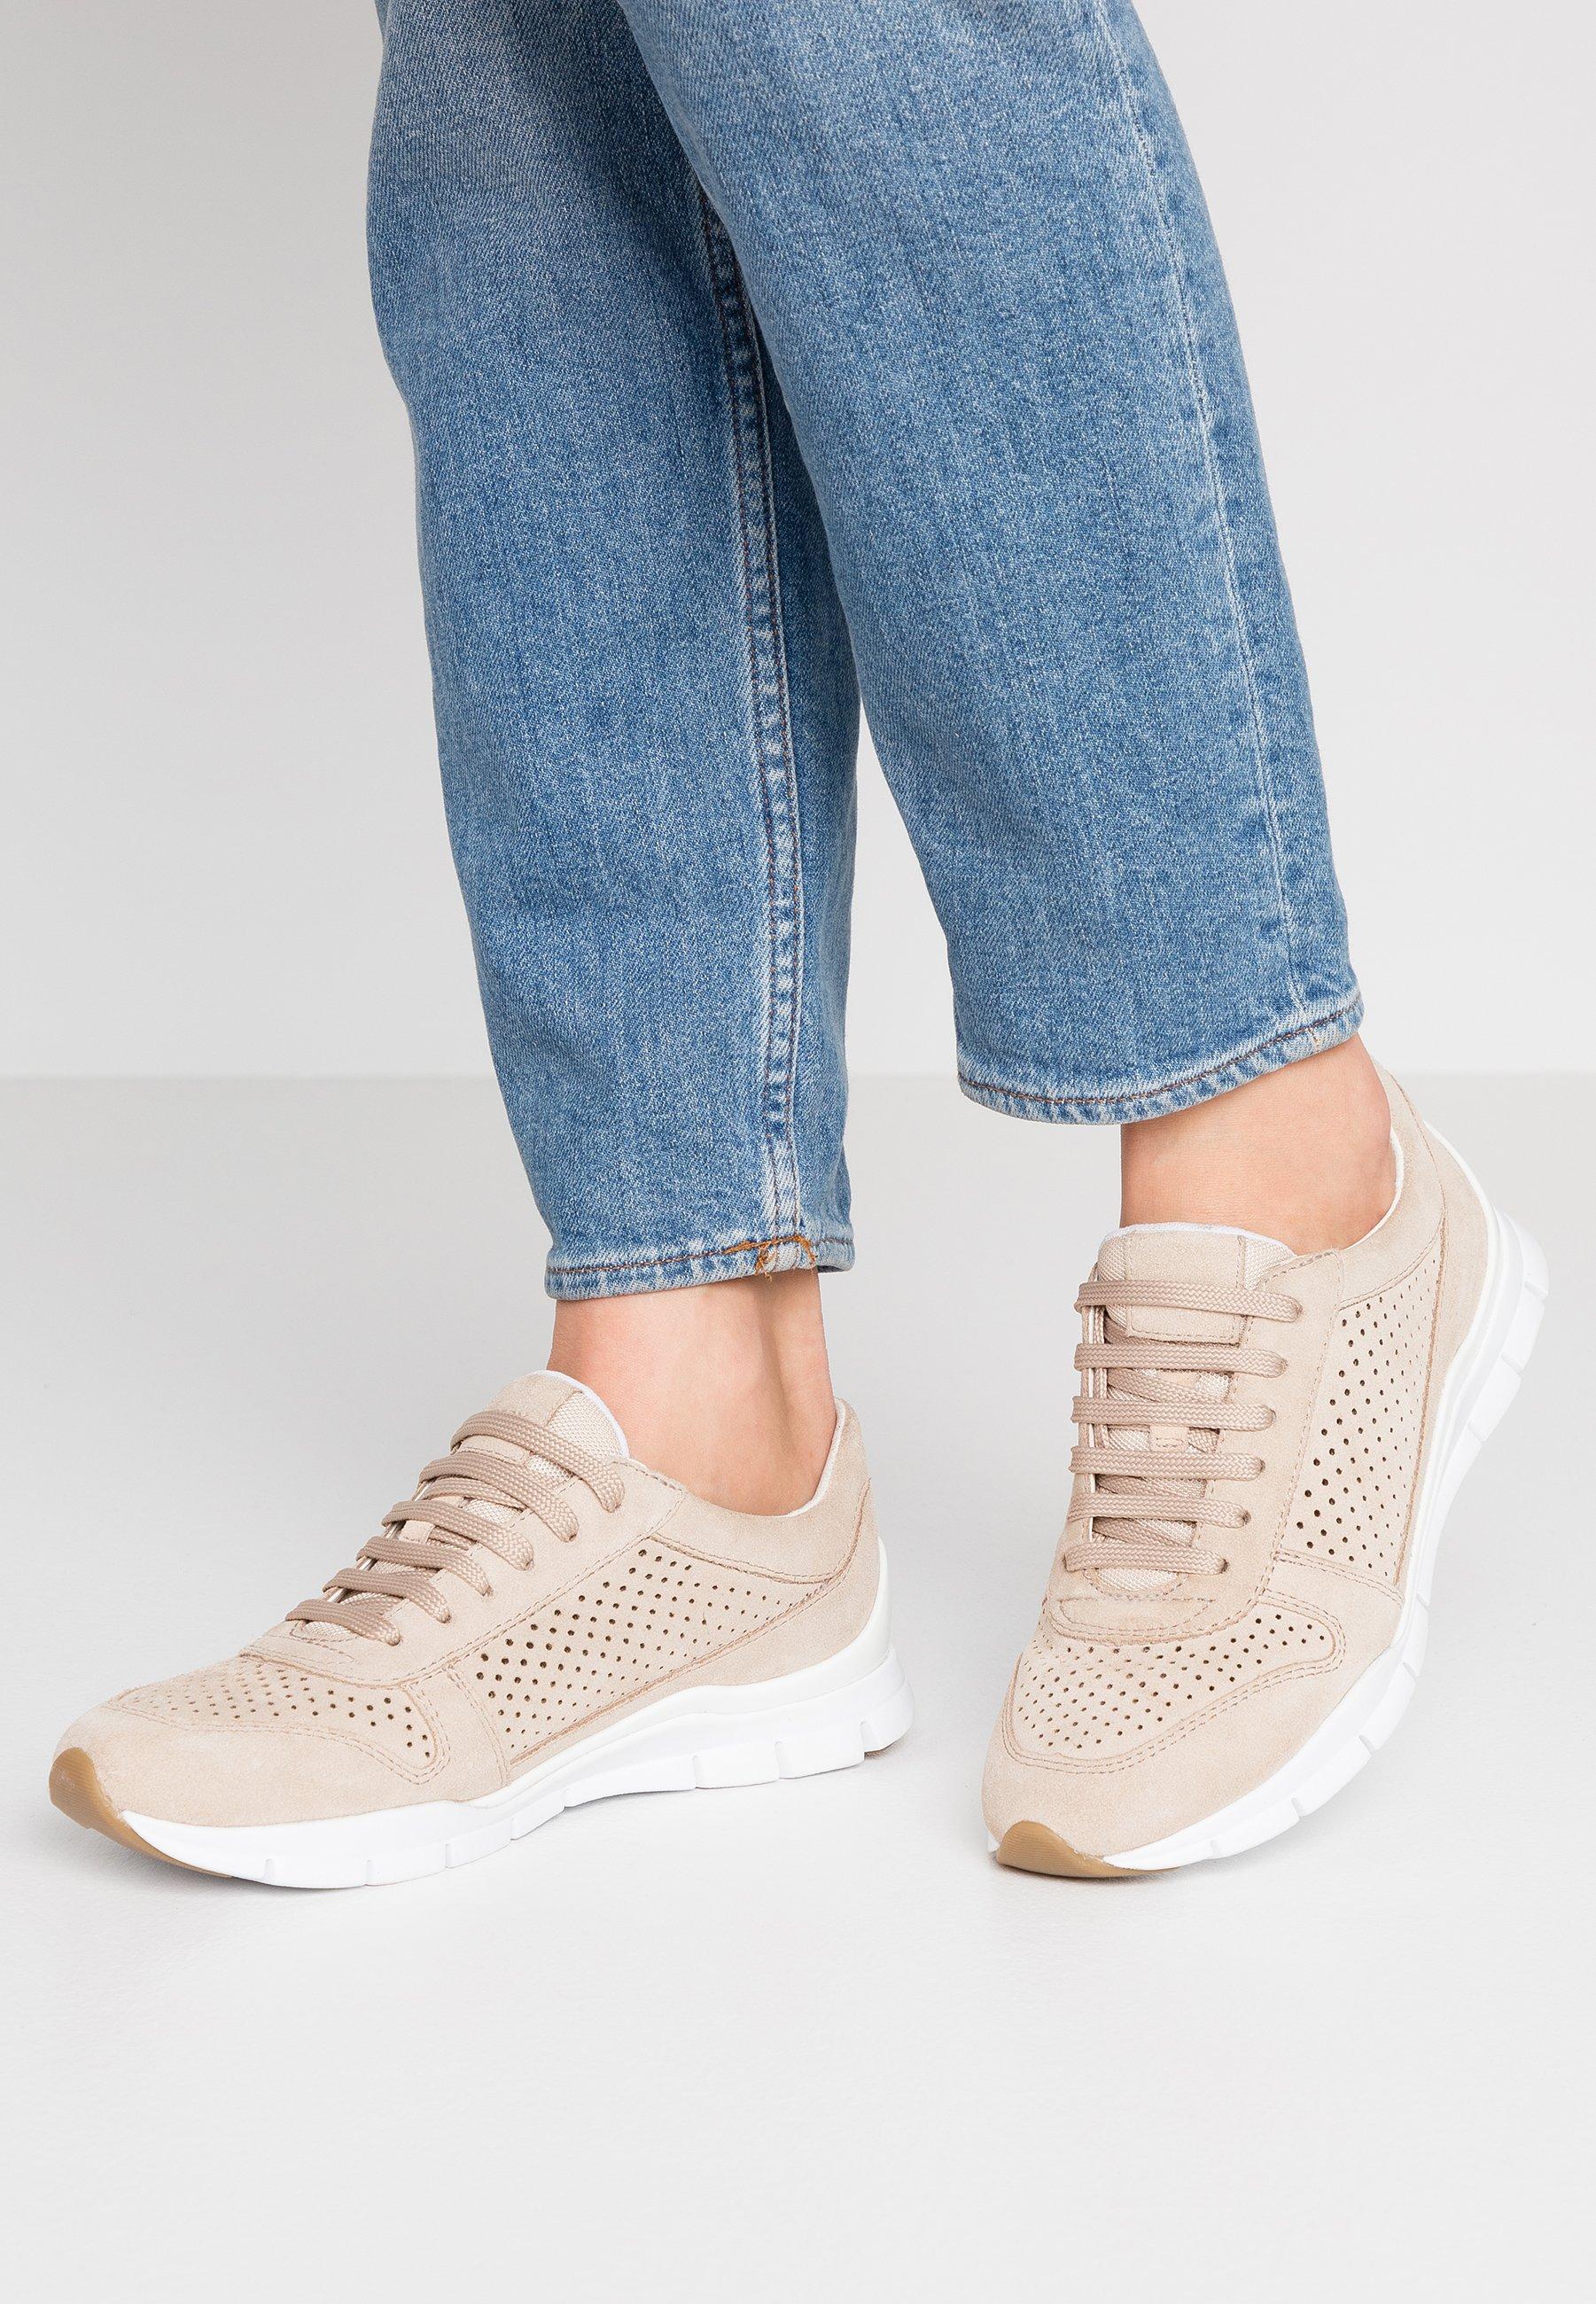 Fahrenheit regular Énfasis  حساس ذابل وفد geox sukie sneakers - englishtoportuguesetranslation.com